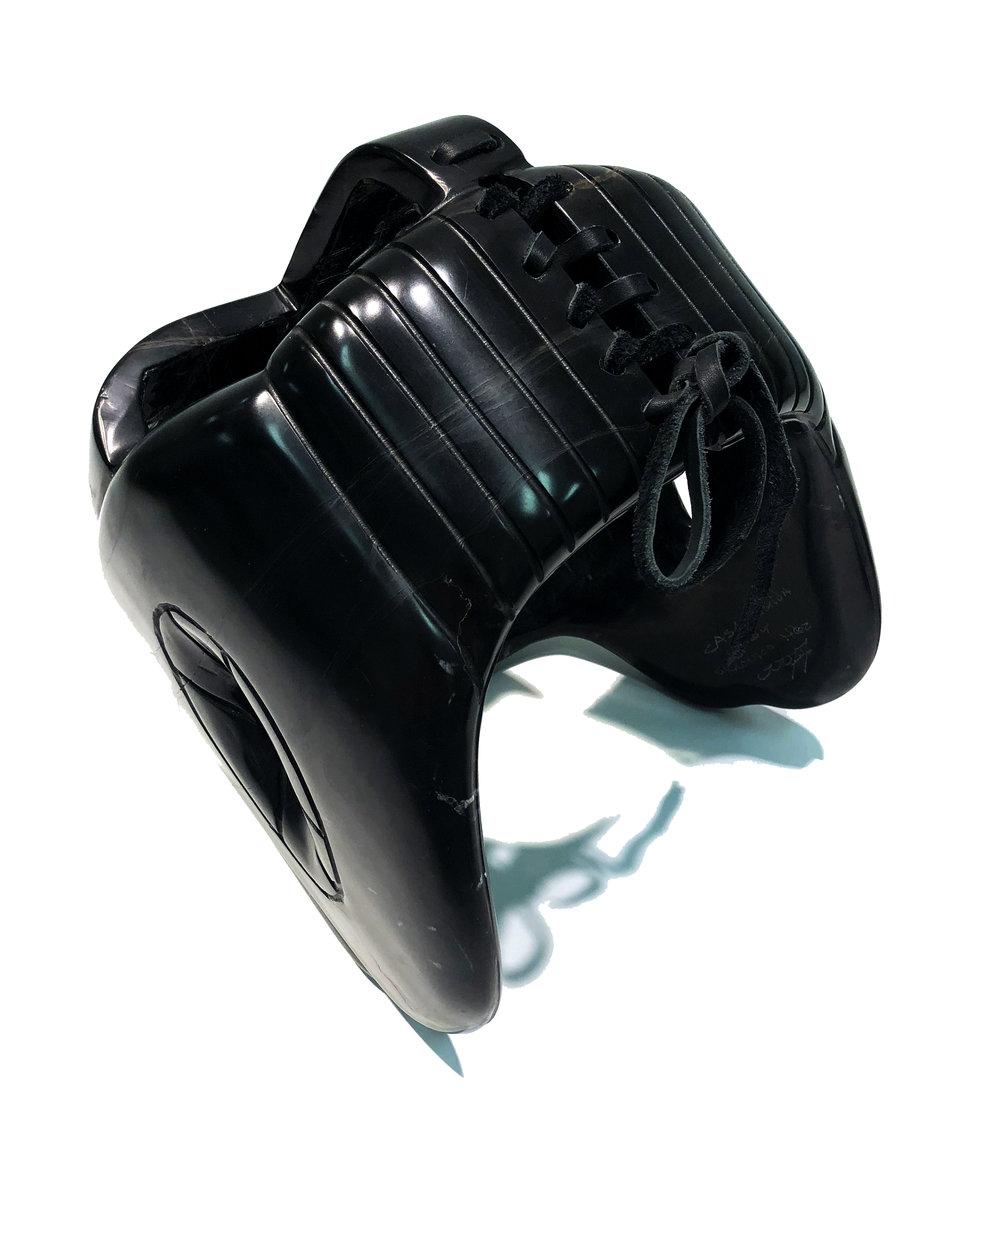 KL_Boxing Gear_Black Marble_23x23x23cm04.jpg